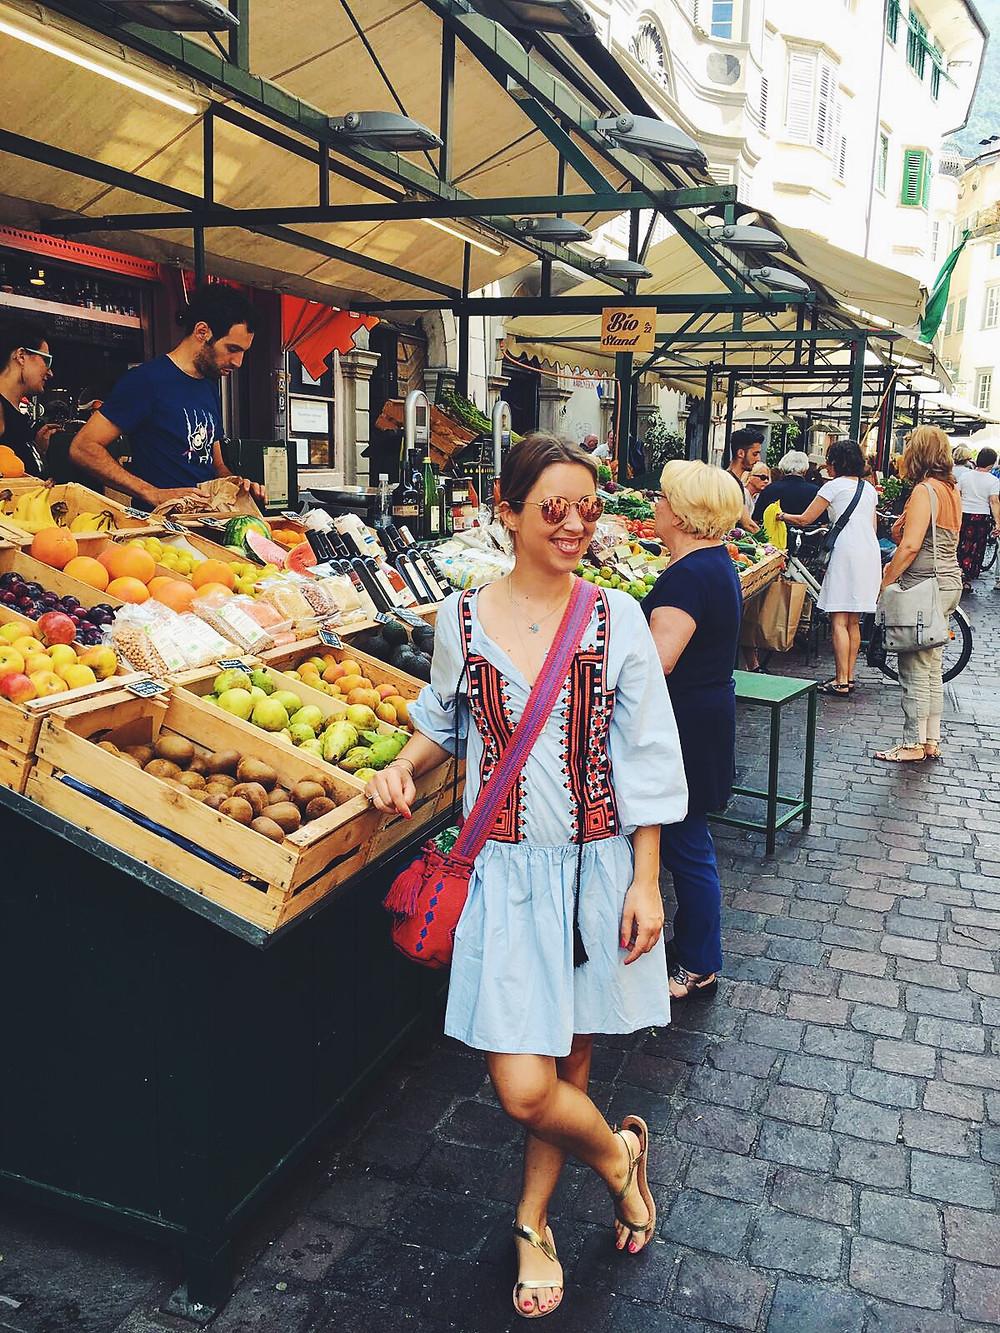 Markt Bozen Tirol